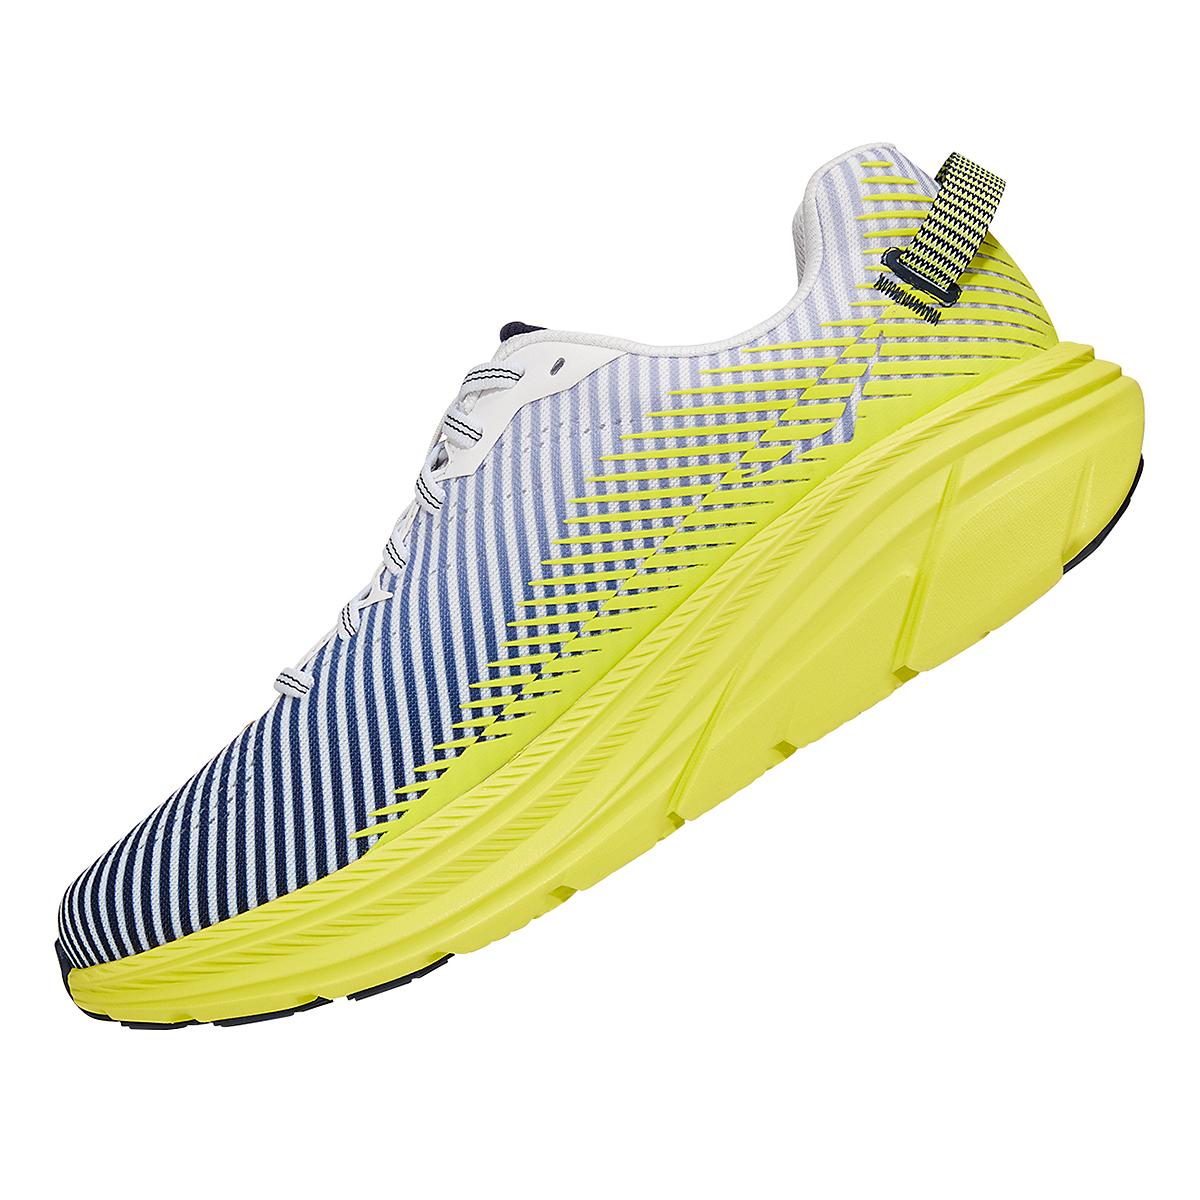 Men's Hoka One One Rincon 2 Running Shoe - Color: White/Yellow - Size: 7 - Width: Regular, White/Yellow, large, image 2